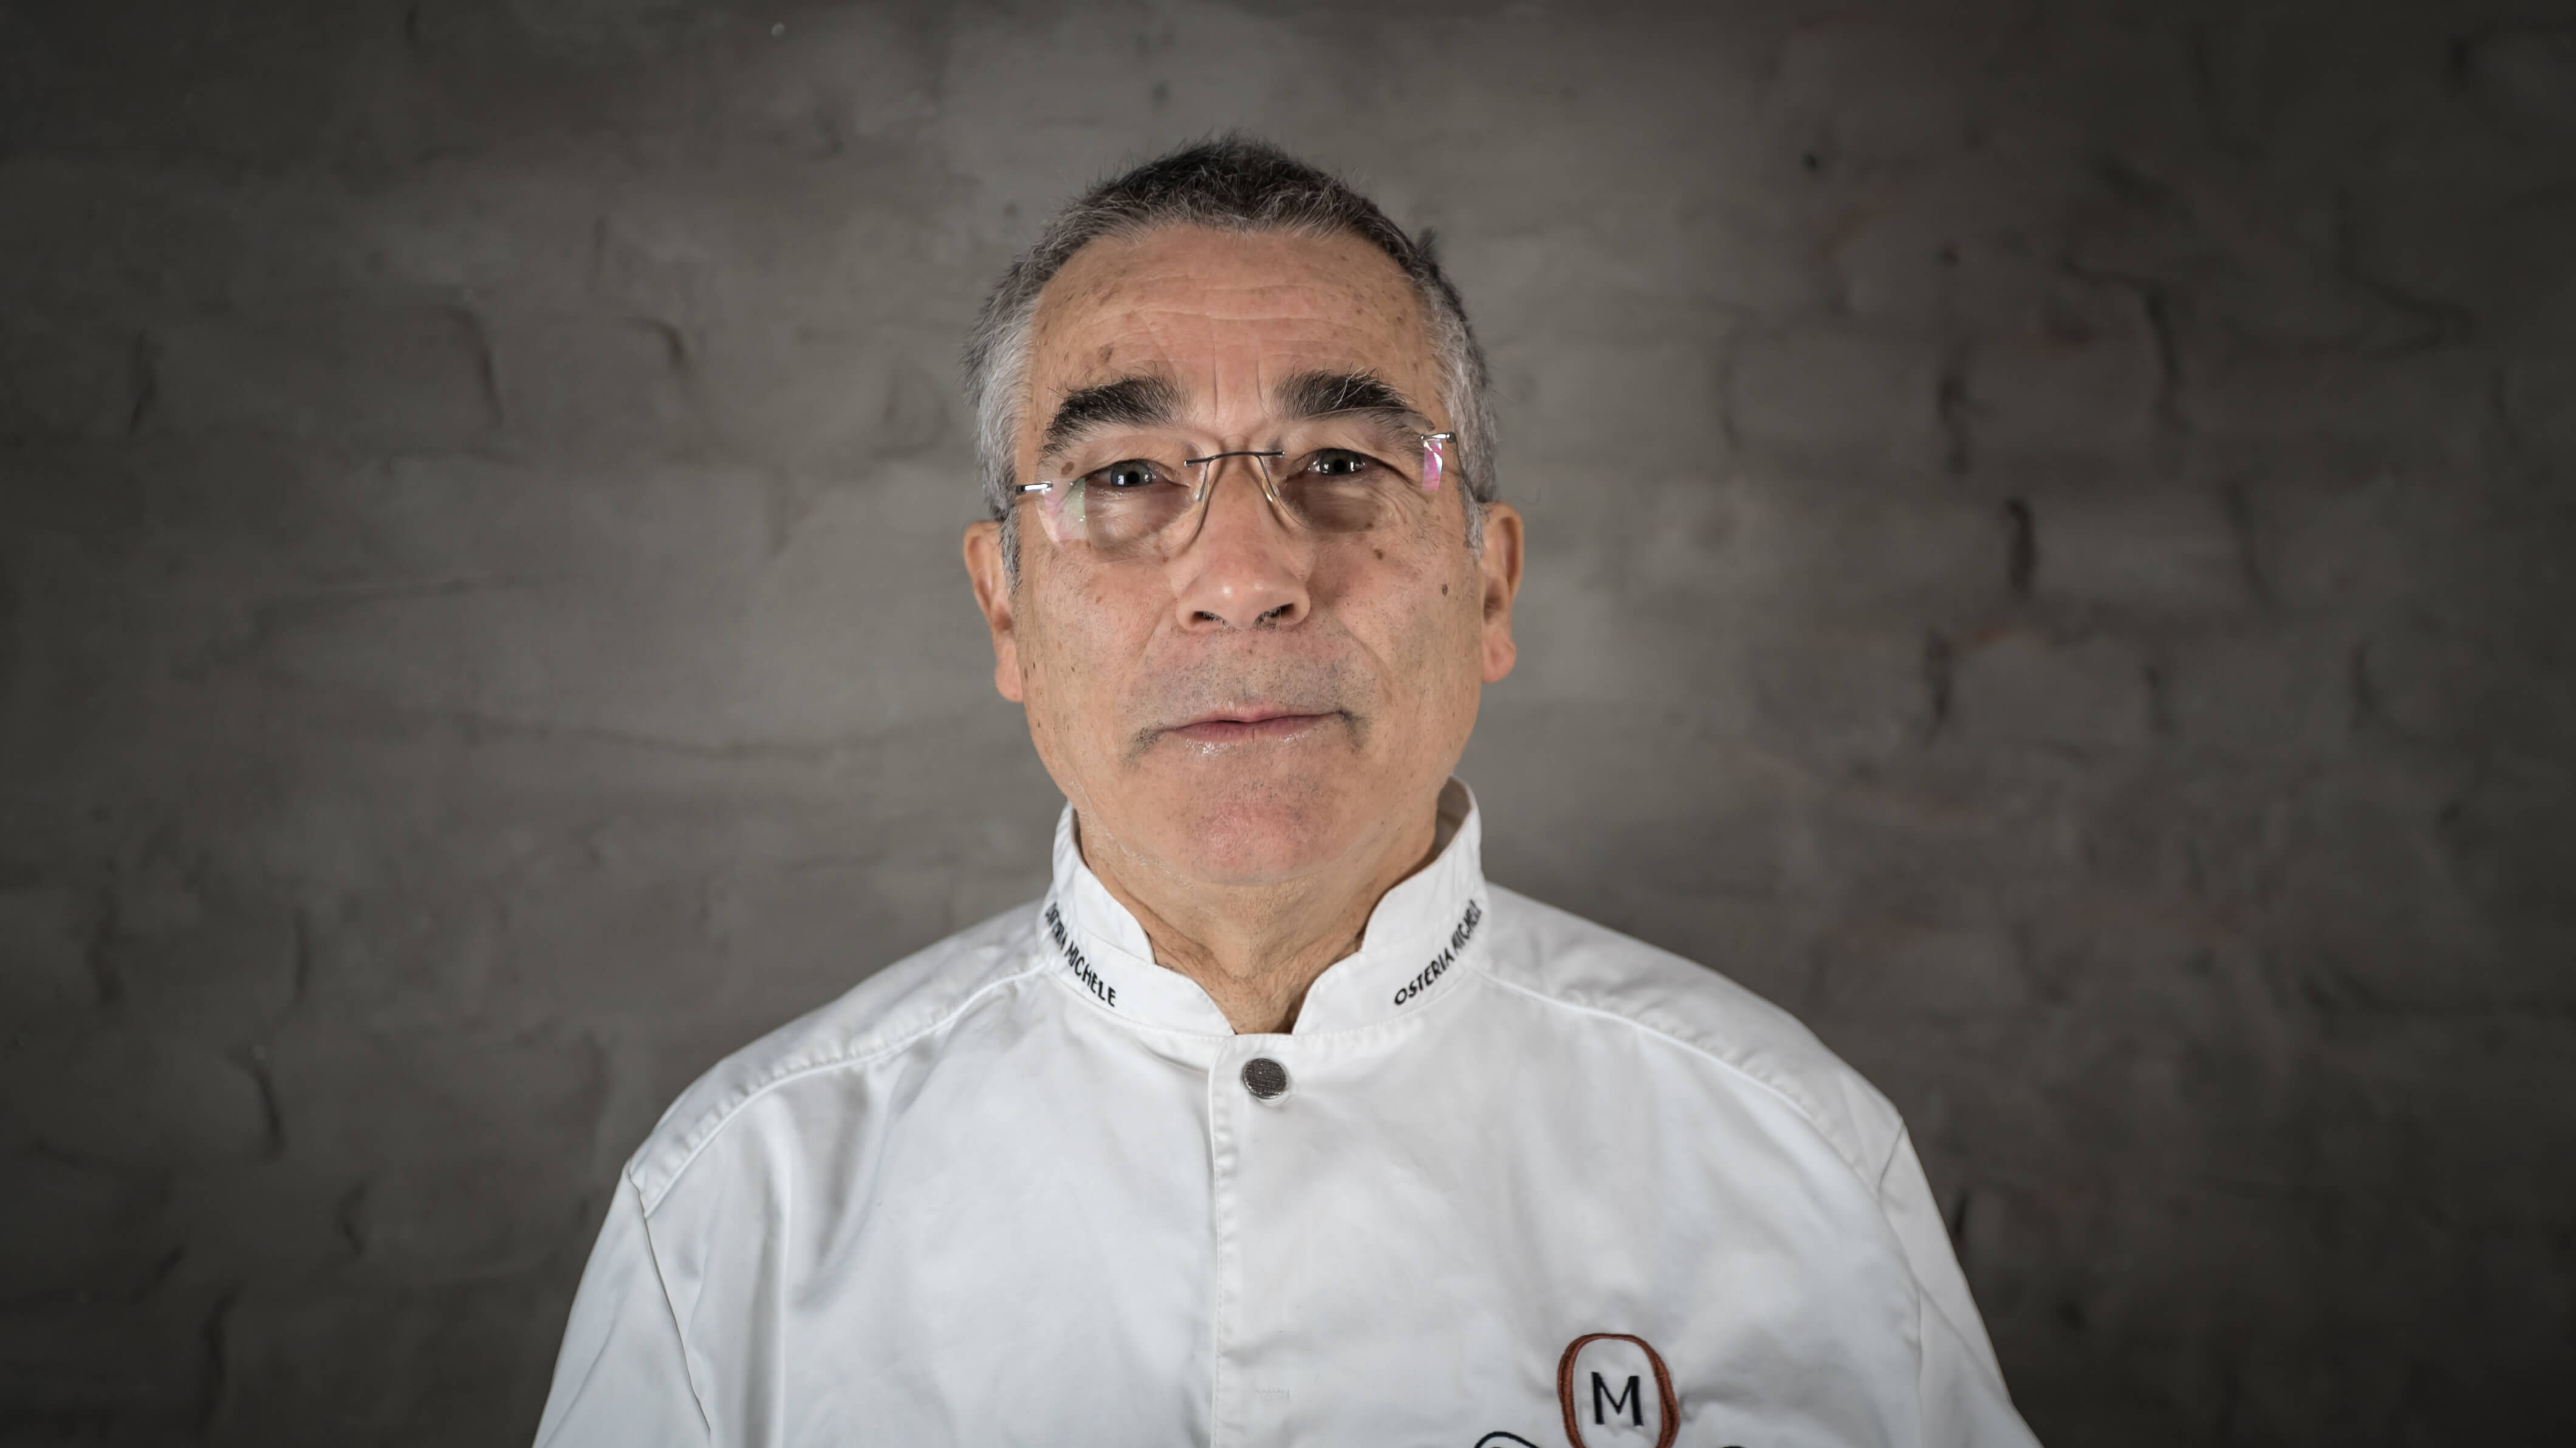 Foto van chef Alfonso Manzi van Osteria Michele Laken